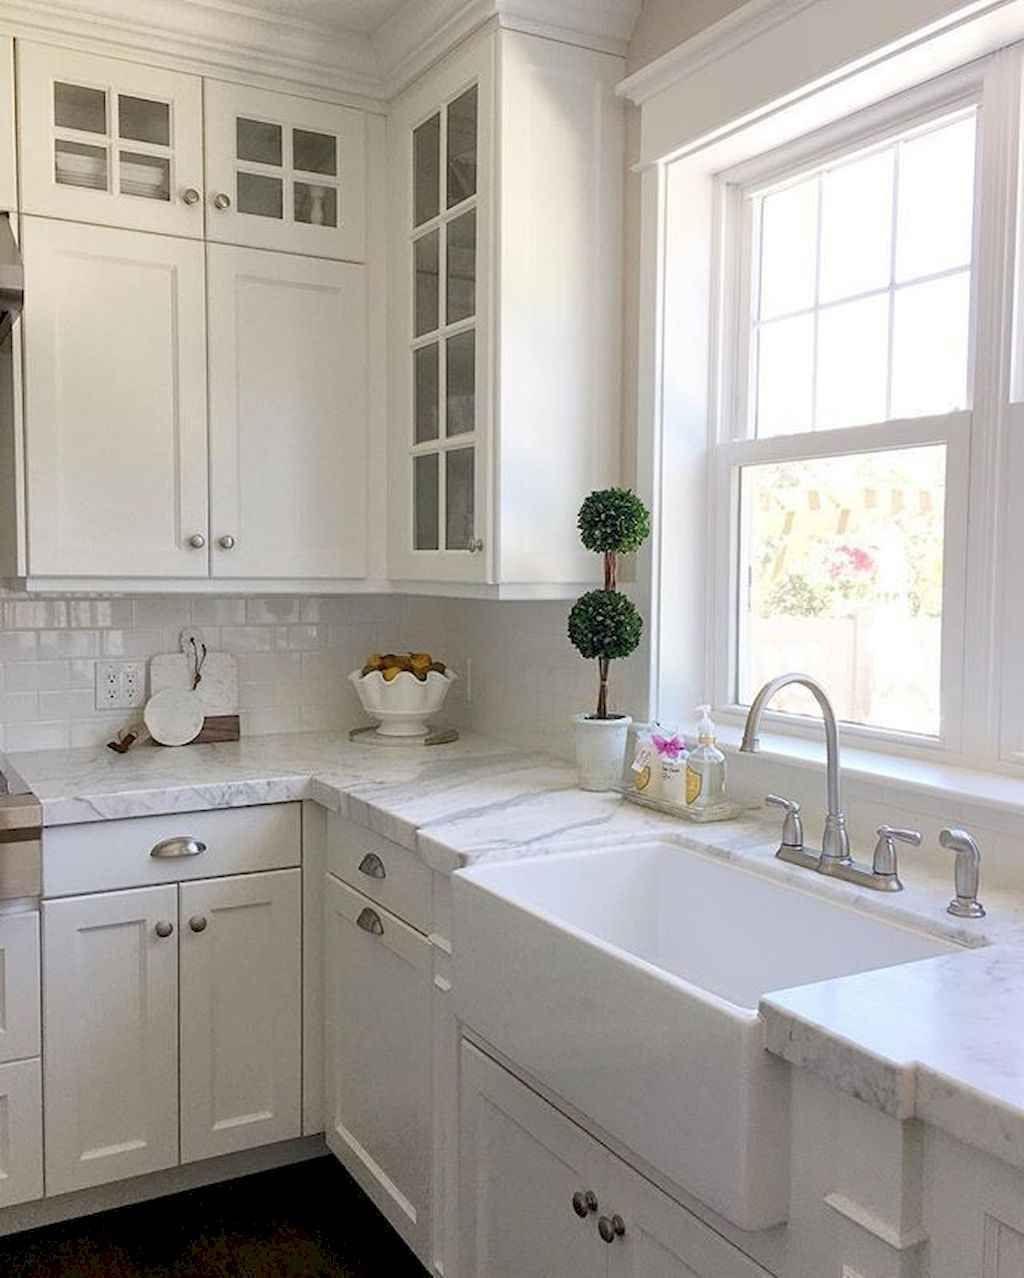 70 Modern Farmhouse Kitchen Sink Decor Ideas Kitchen